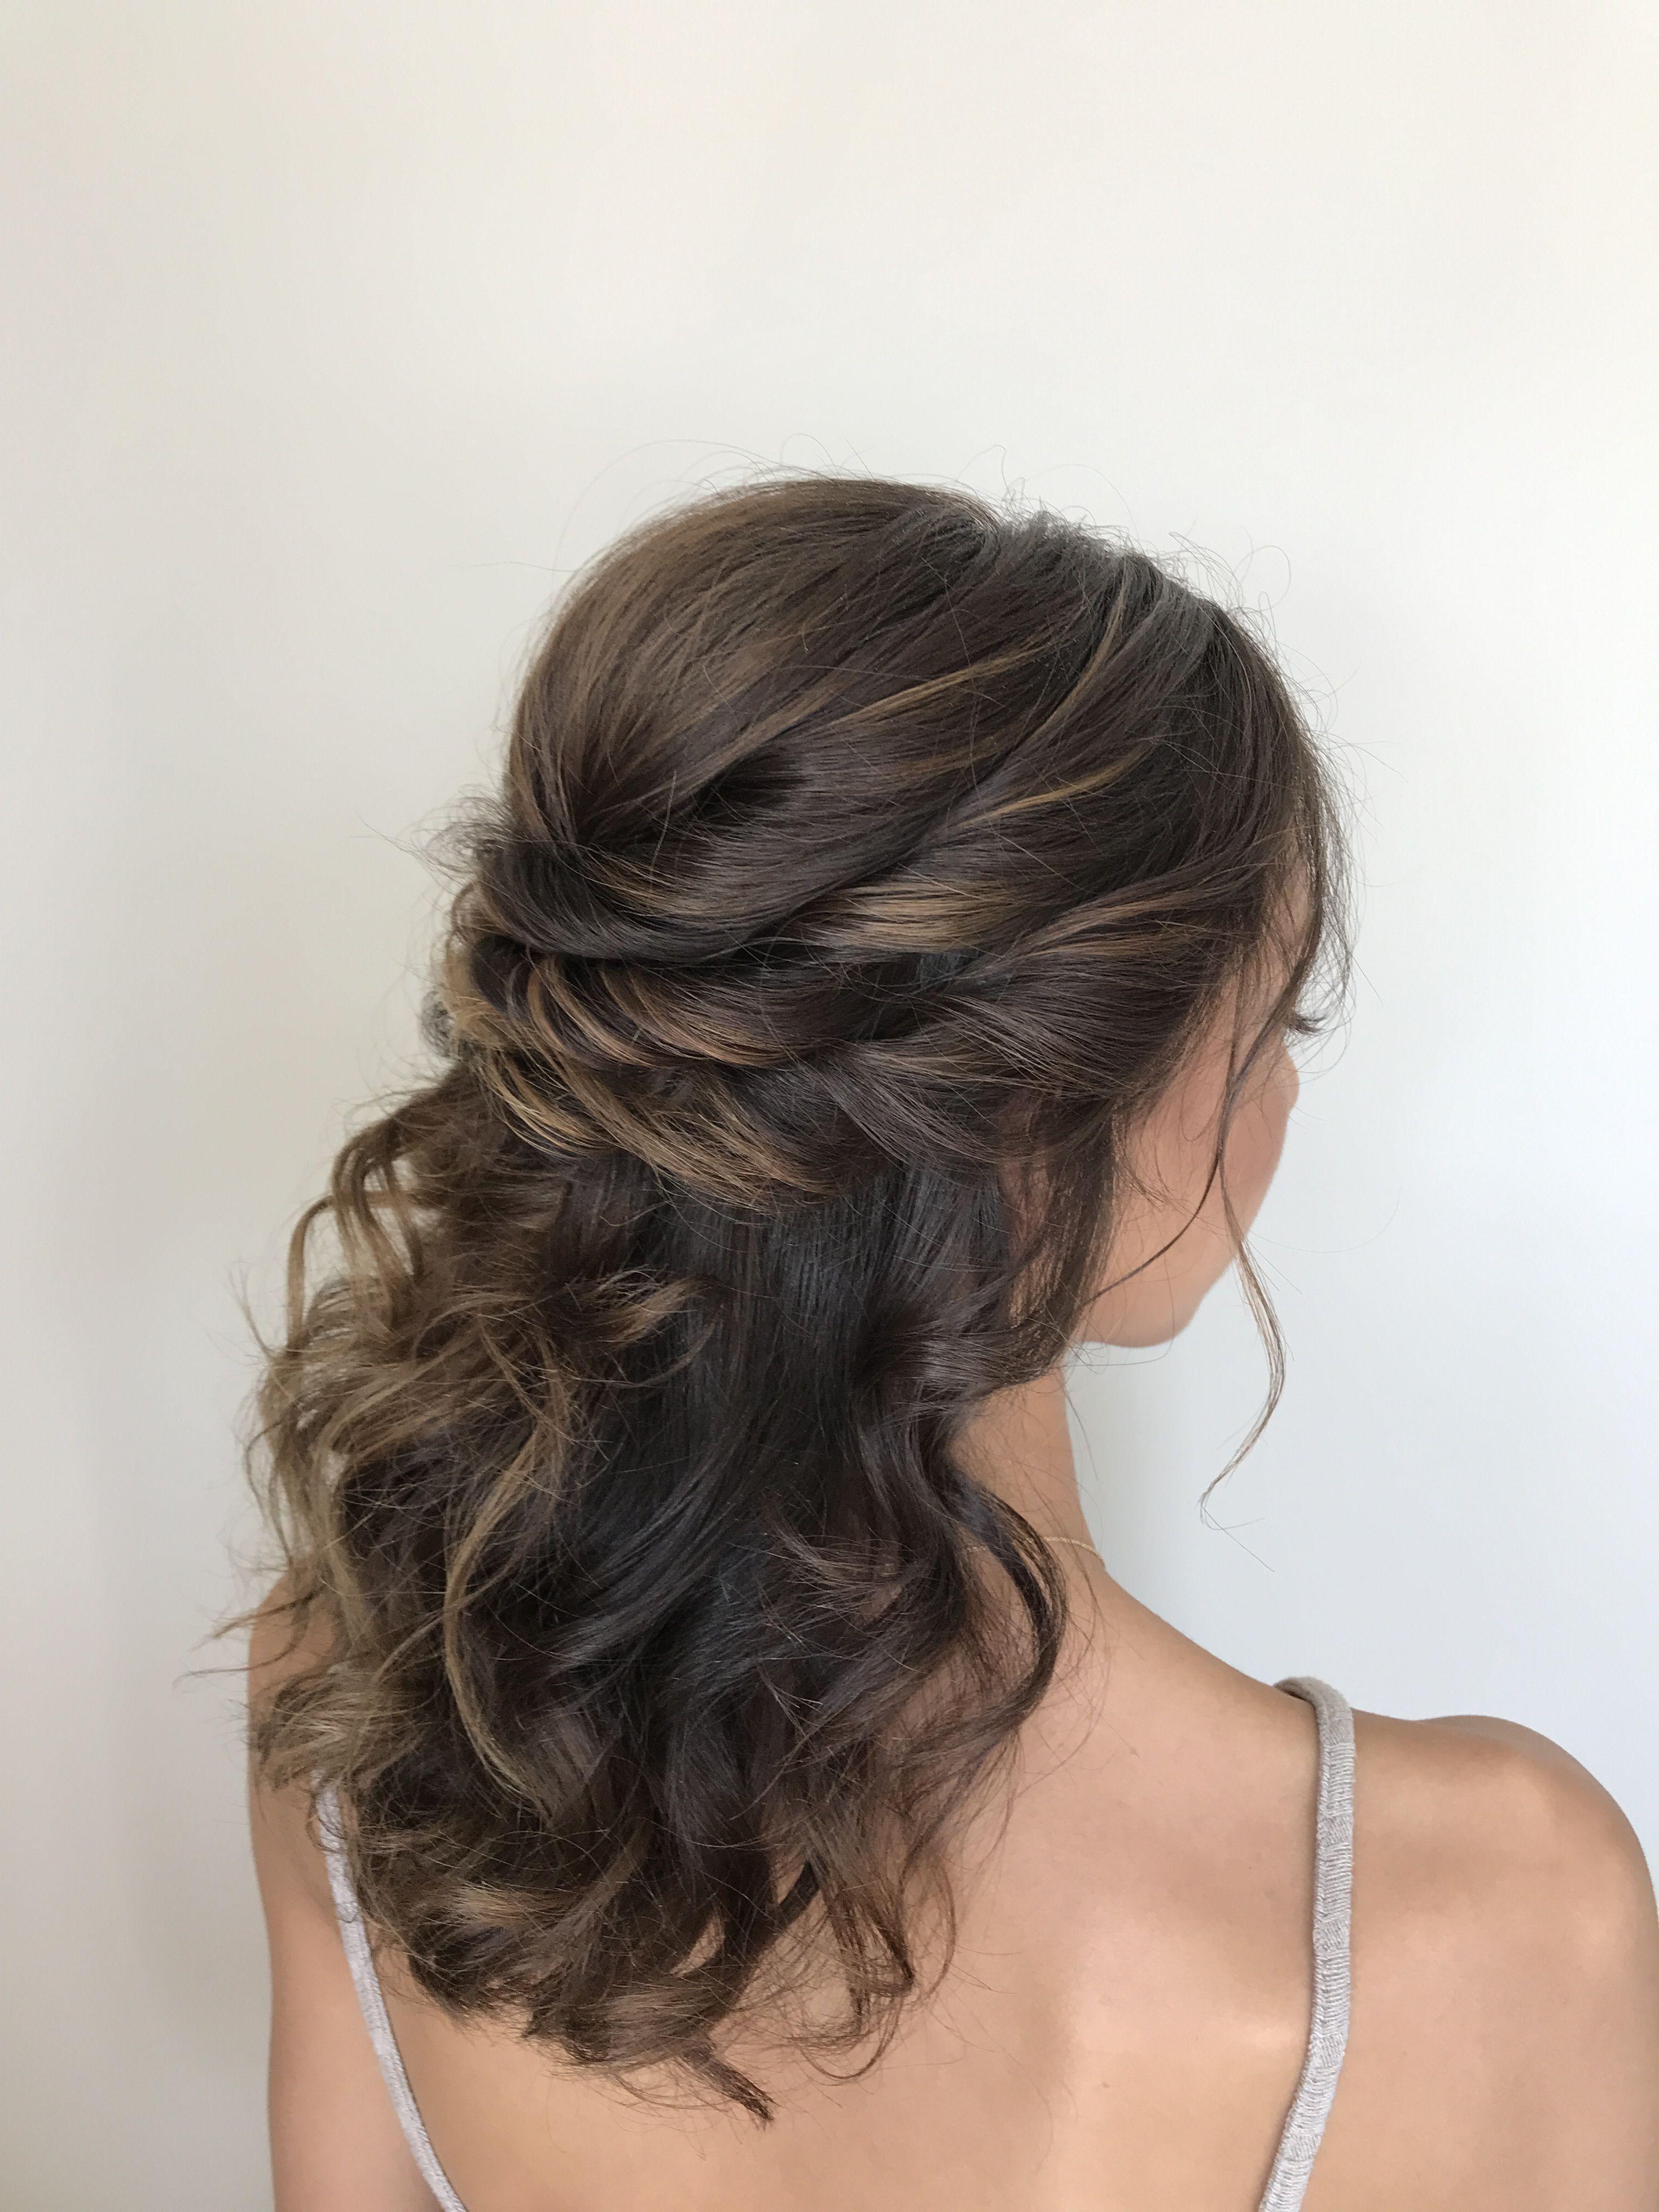 Bridal Hair Half Up Half Down Weddinghairstyles Wedding Hairstyles For Medium Hair Hair Styles Curly Prom Hair